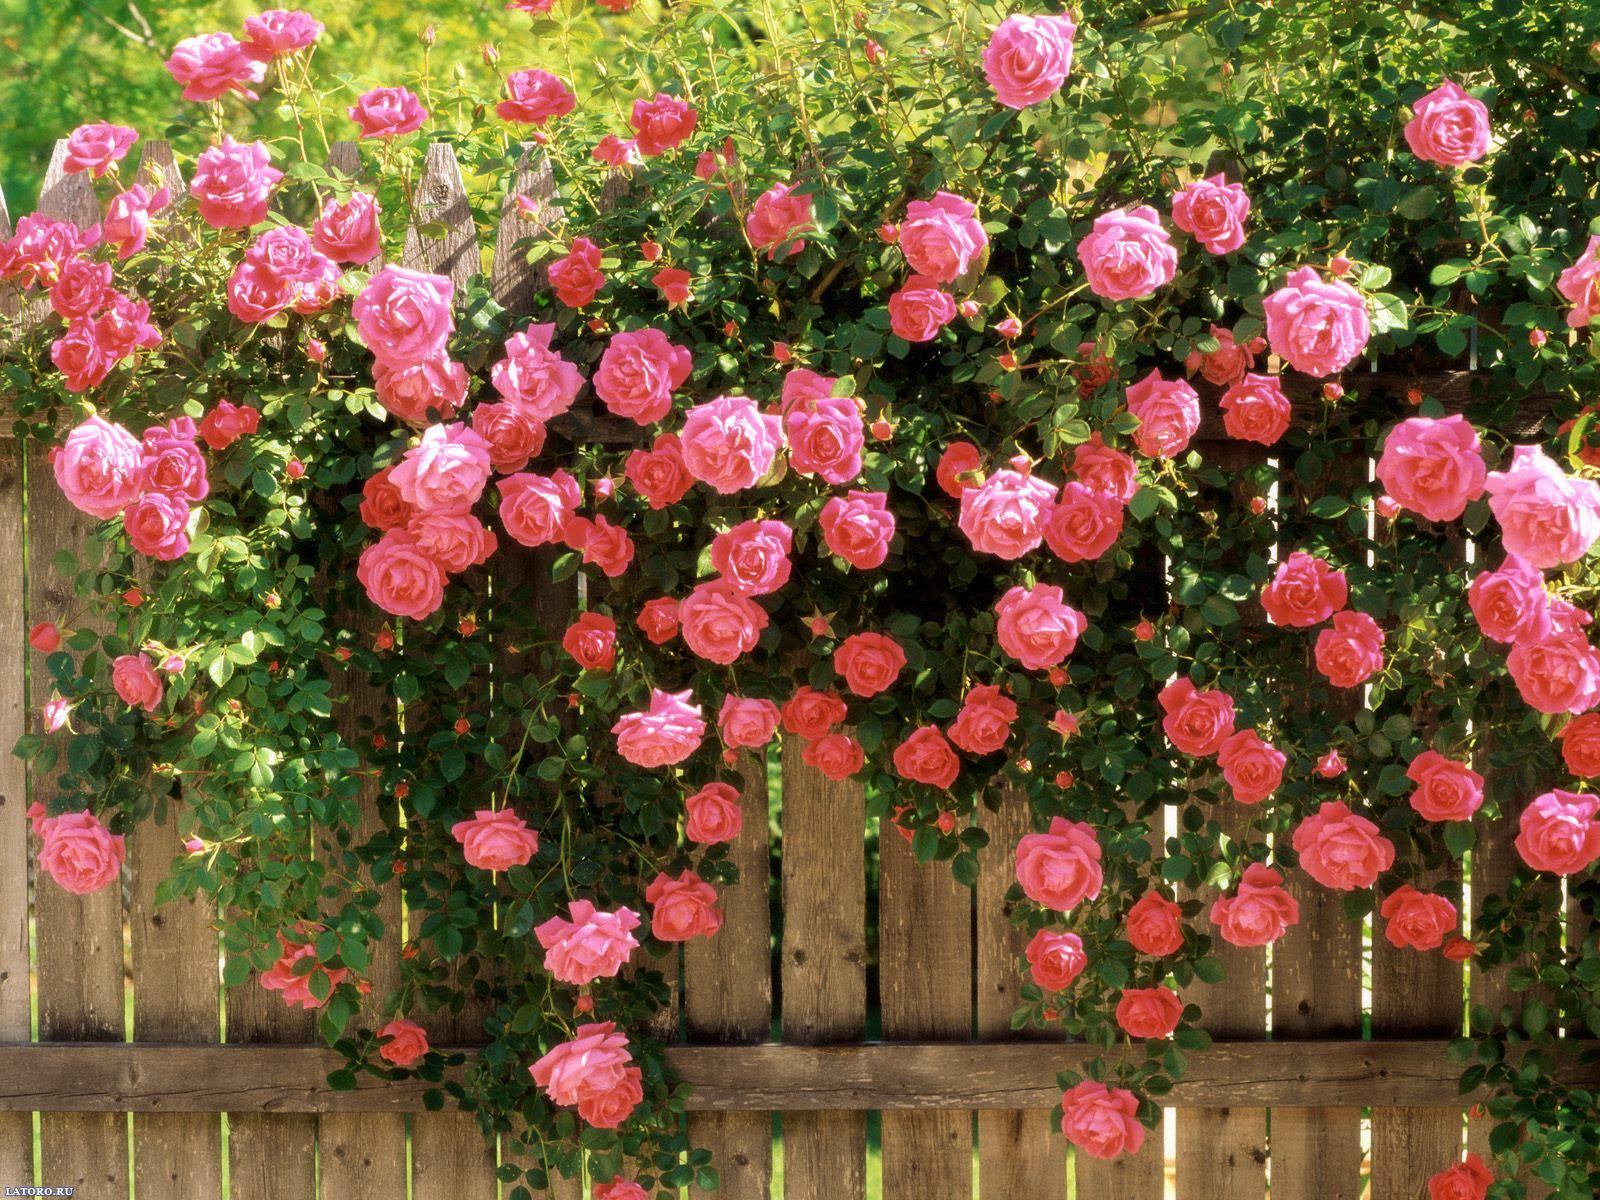 http://3.bp.blogspot.com/-LgGHNyGM8pg/TkmxX4jIovI/AAAAAAAAByk/8UMFq32xG-4/s1600/10121-desktop-wallpapers-roses.jpg